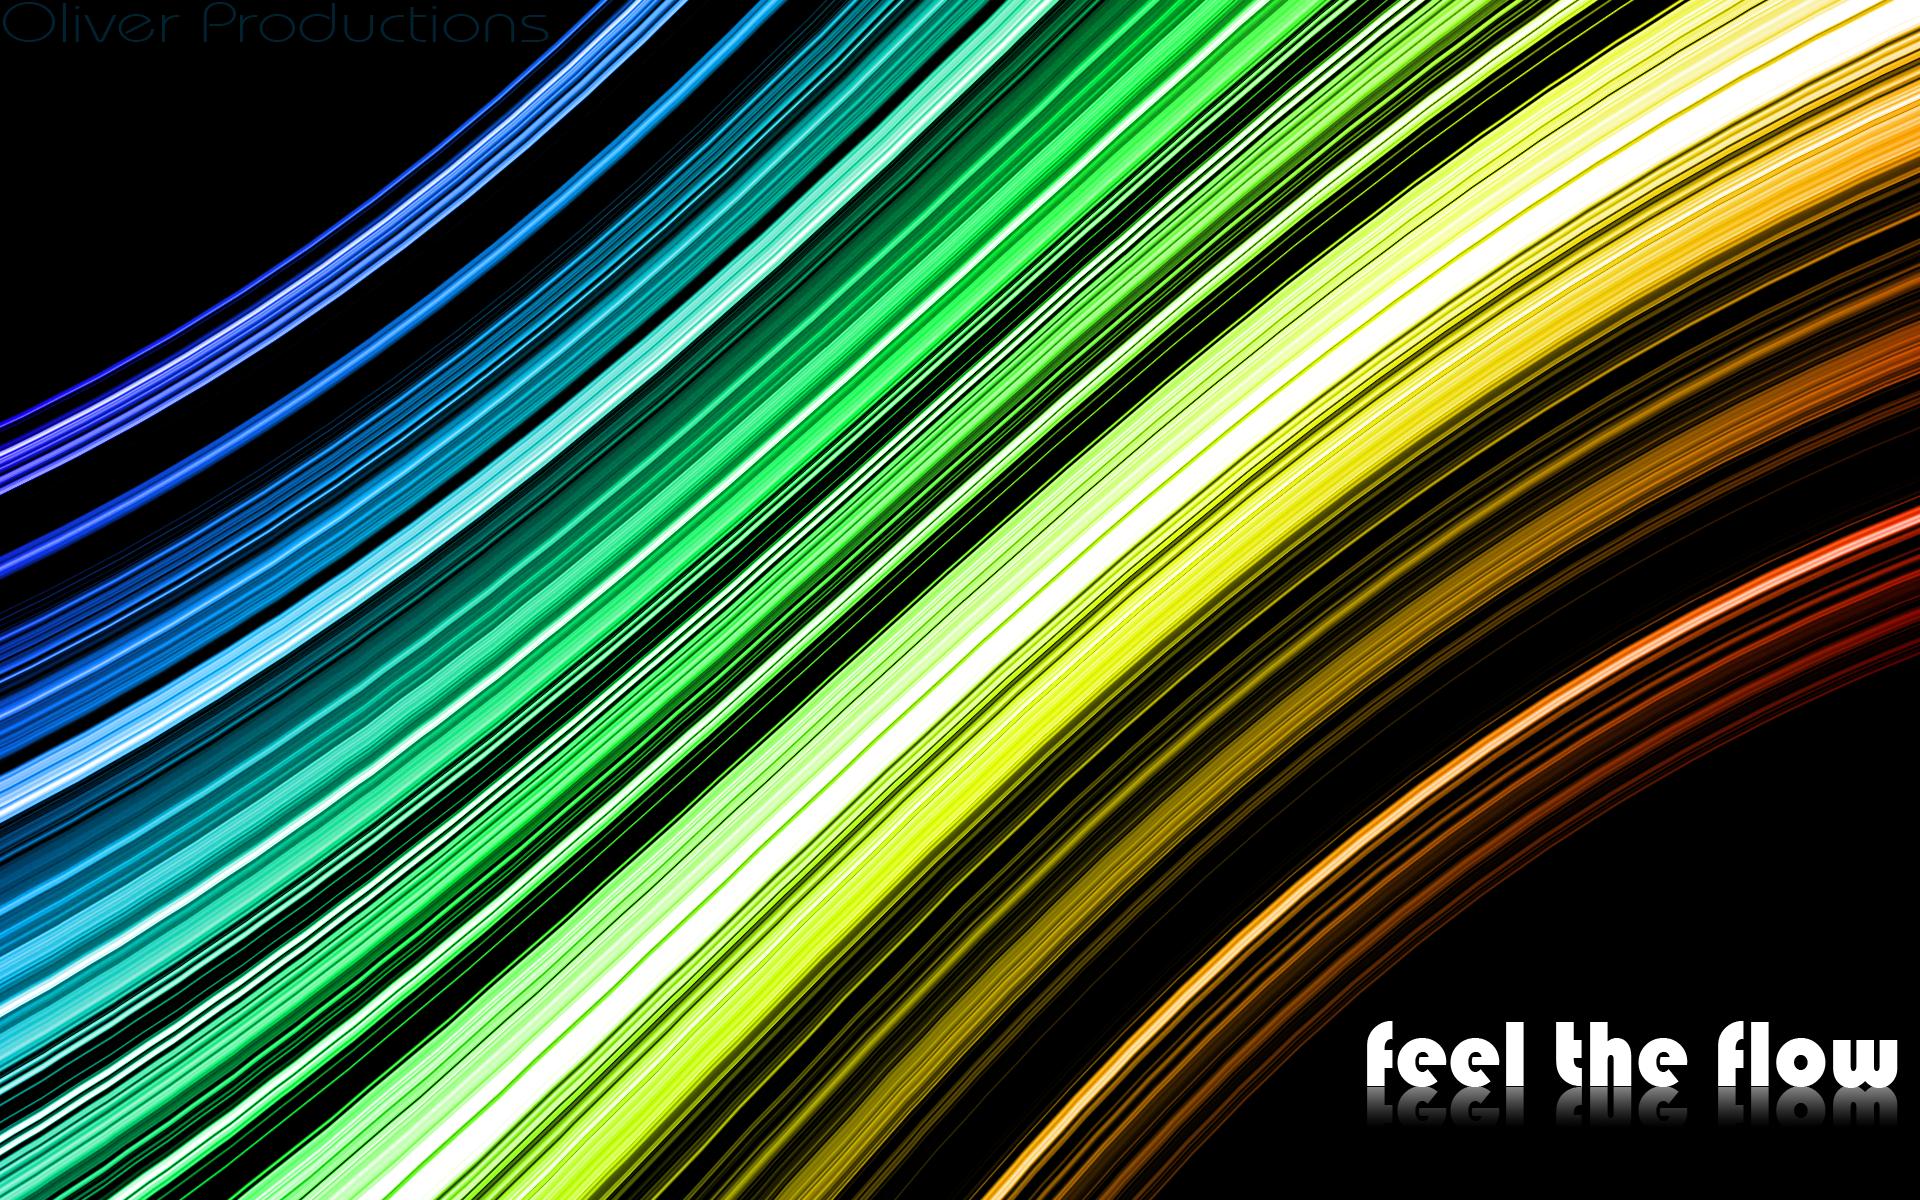 Flow HD Wallpapers Backgrounds Wallpaper